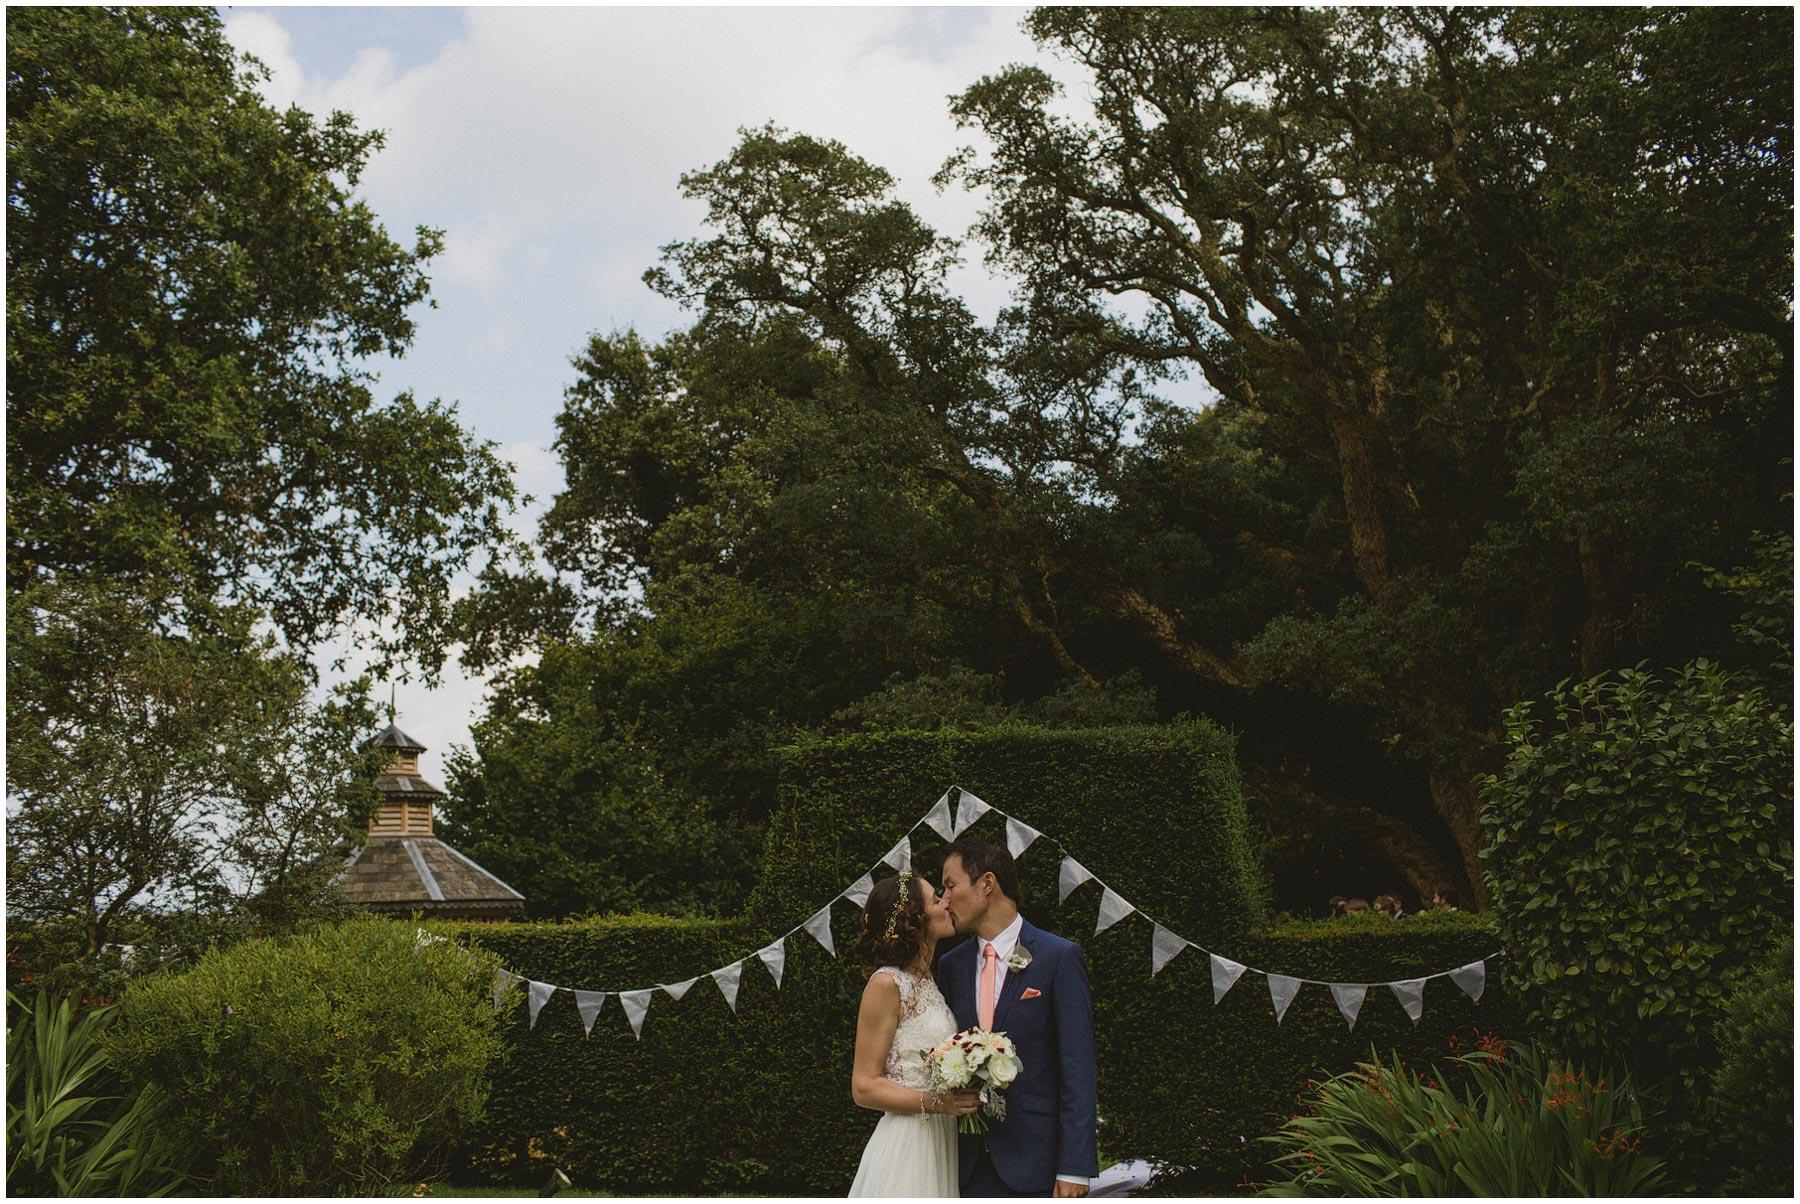 Colehayes-Park-Wedding-Photography_0097